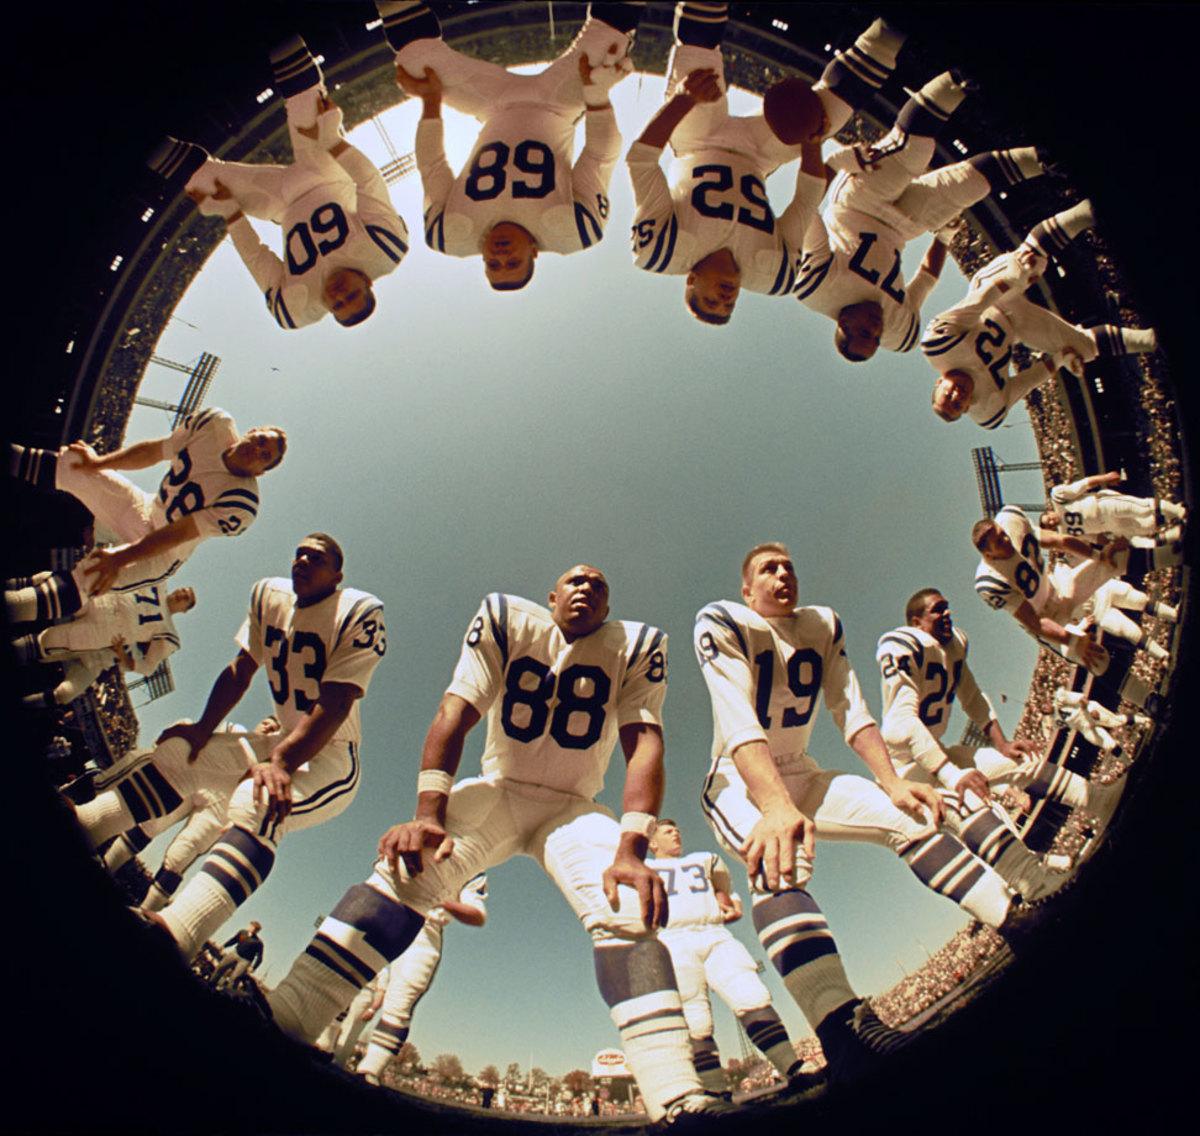 1968-John-Mackey-Johnny-Unitas-NLC_02695.jpg